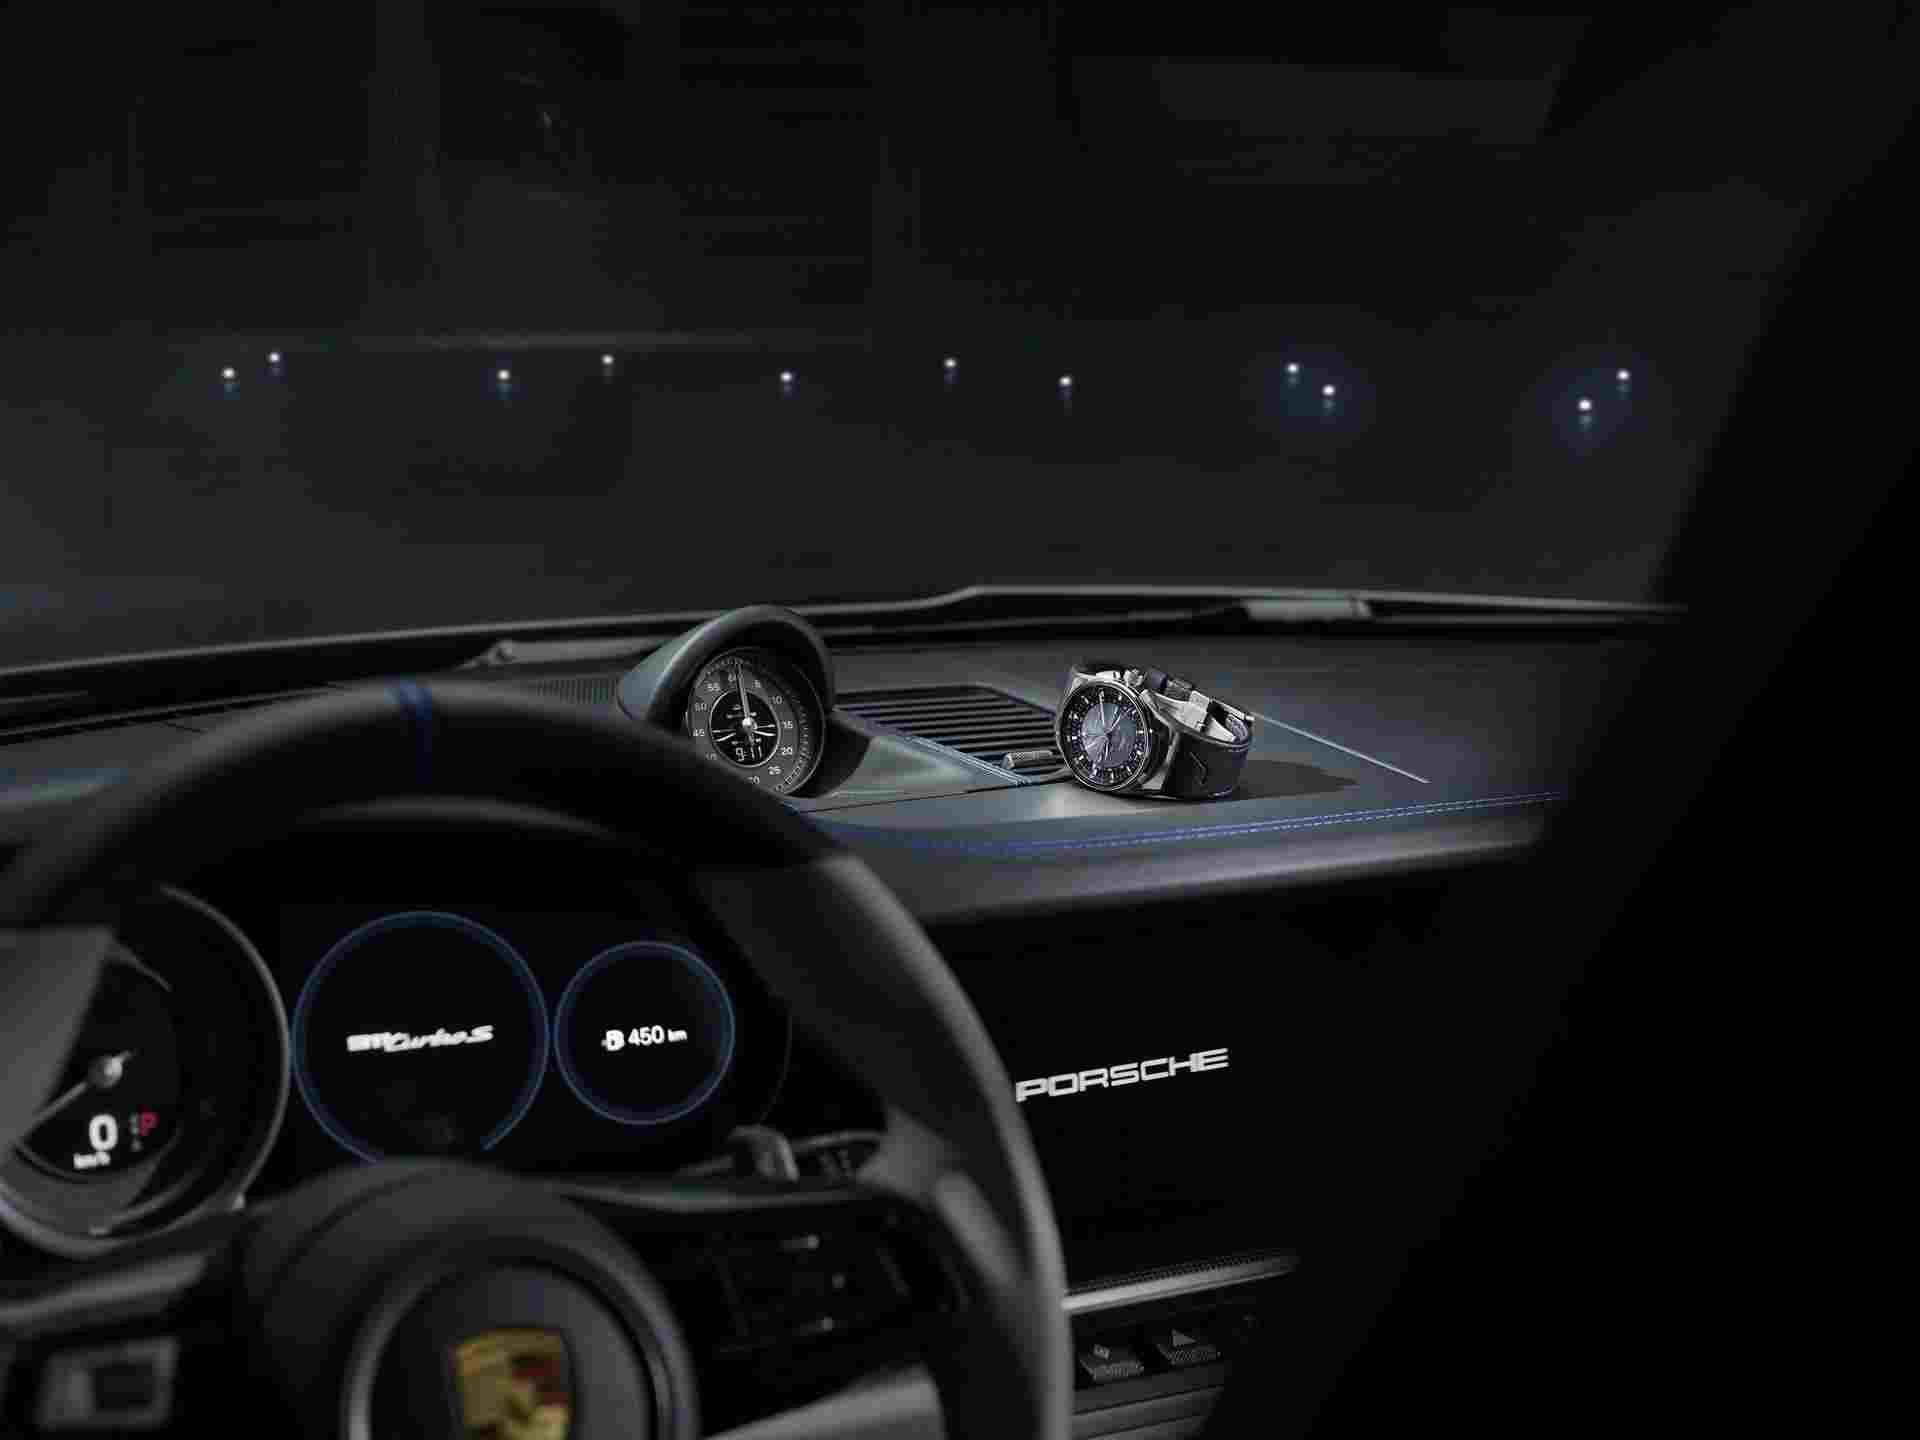 Embraer_Porsche_911_Turbo_S_0000